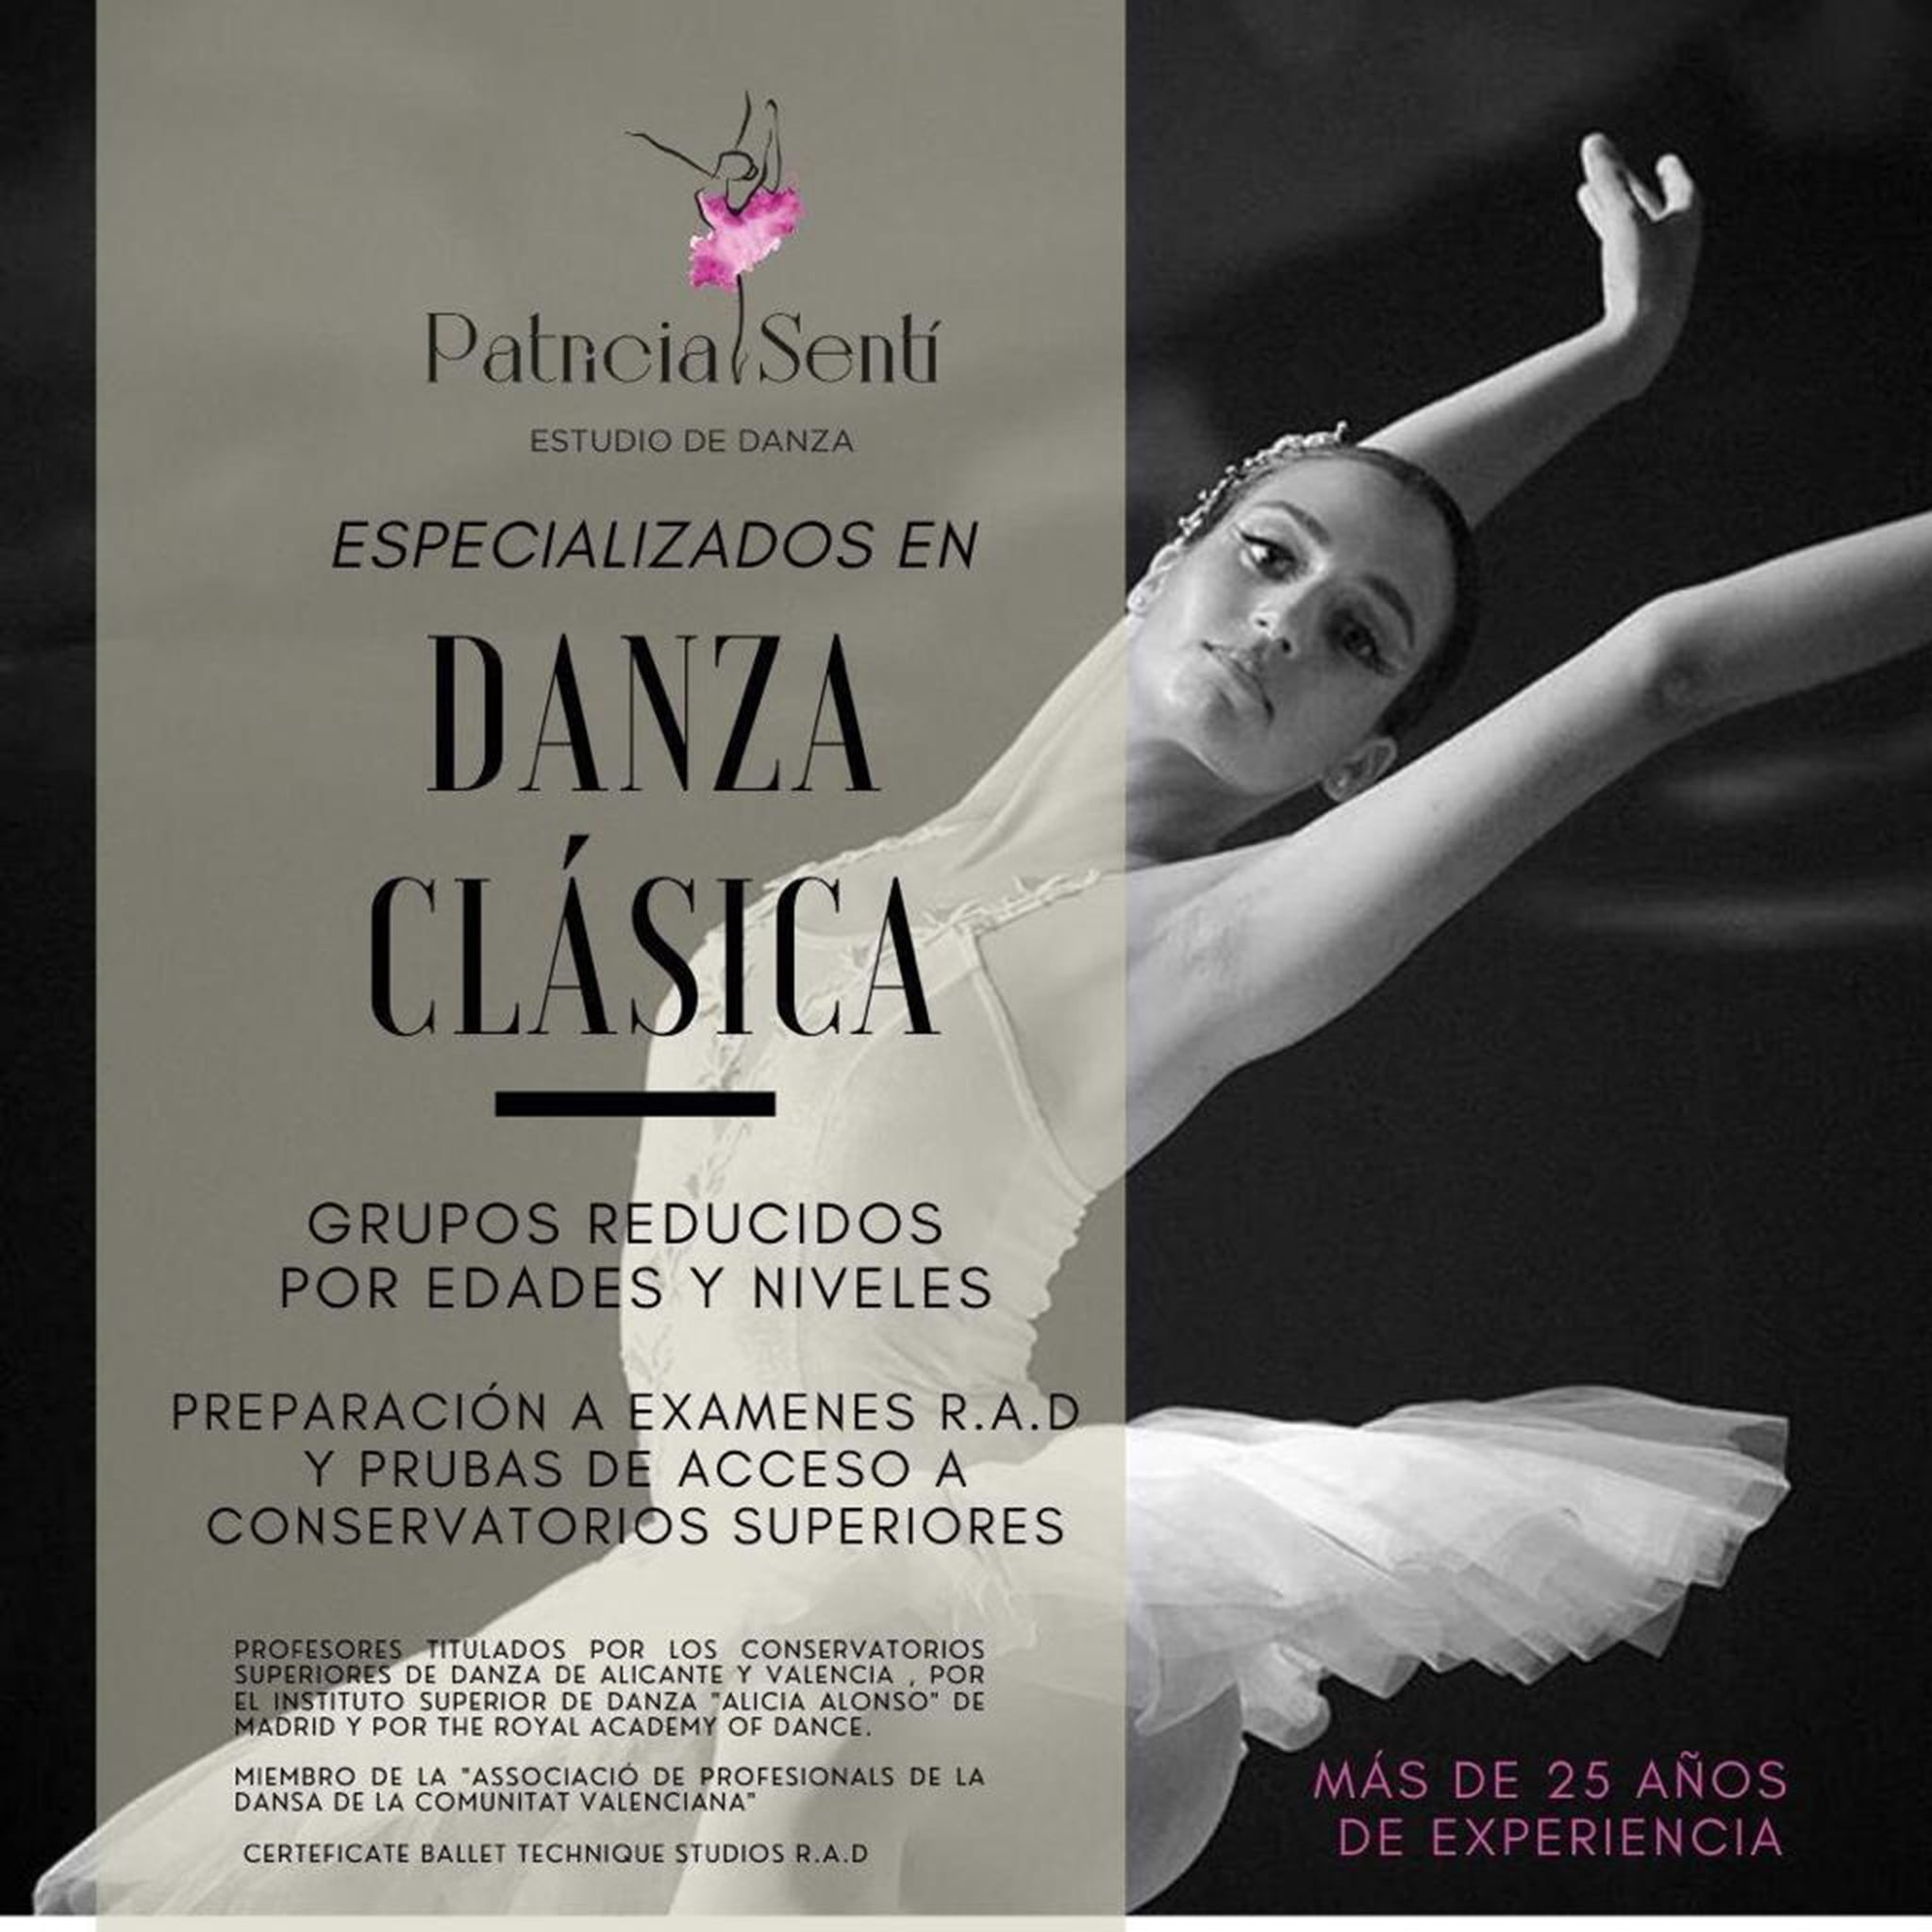 Classical dance classes in Dénia - Patricia Sentí Dance Studio